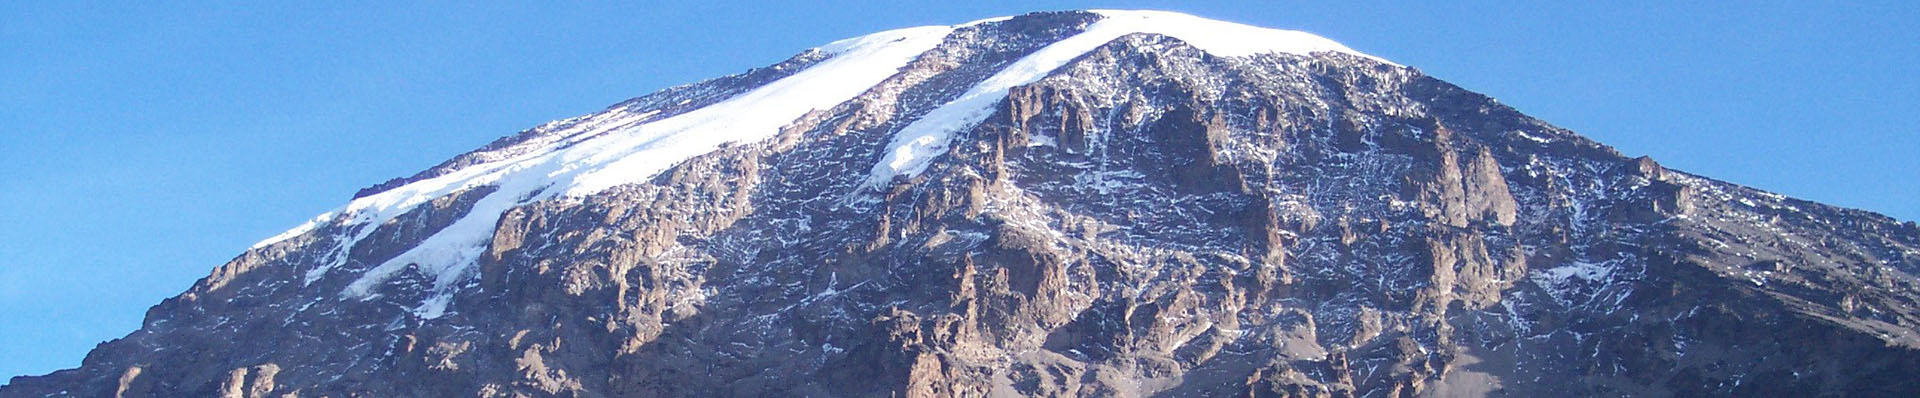 https://www.kilimanjaronaturetours.com/wp-content/uploads/2014/11/lemosho1.jpg